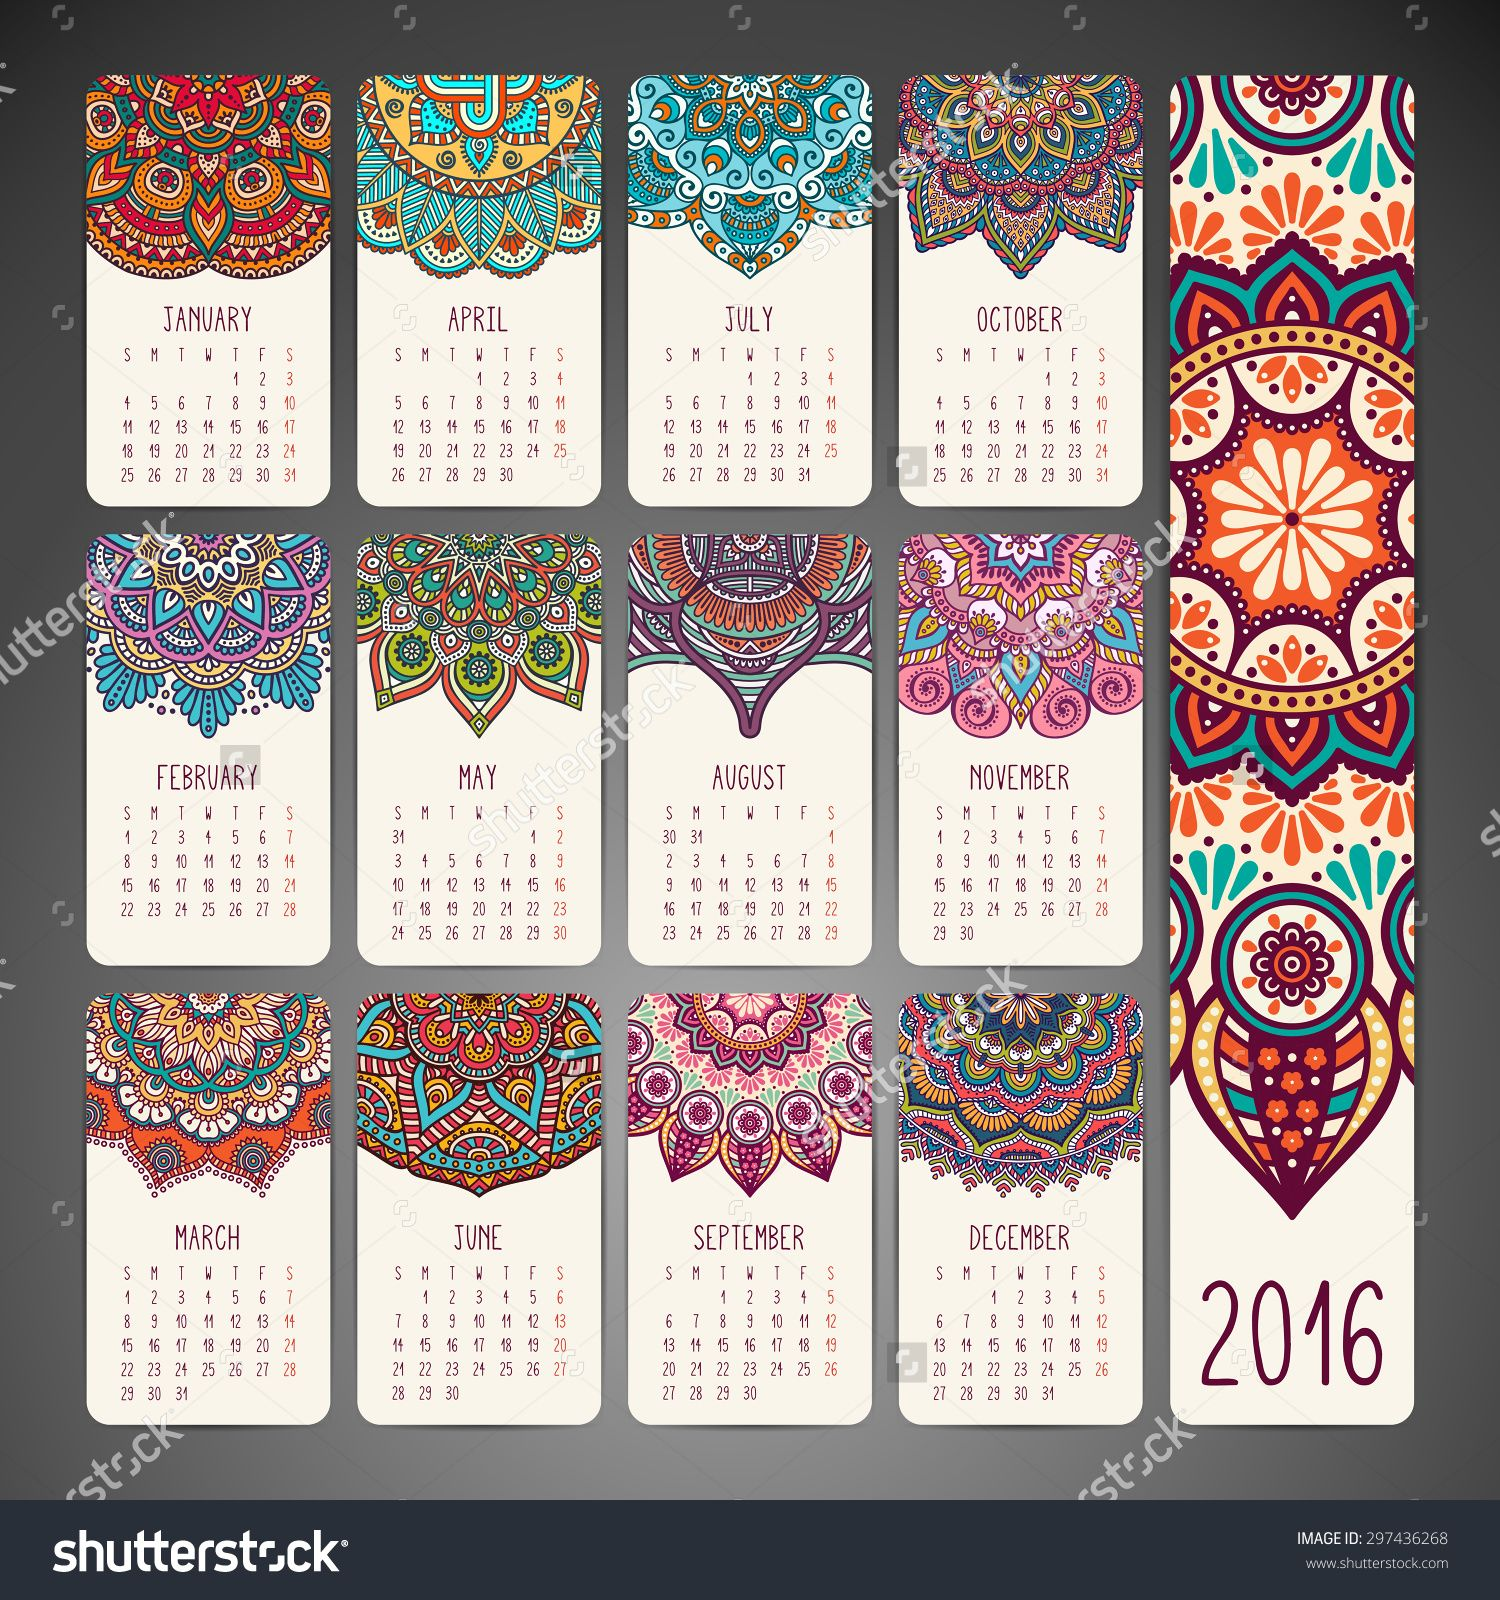 Calendar Design Islamic : Calendar vintage decorative elements oriental